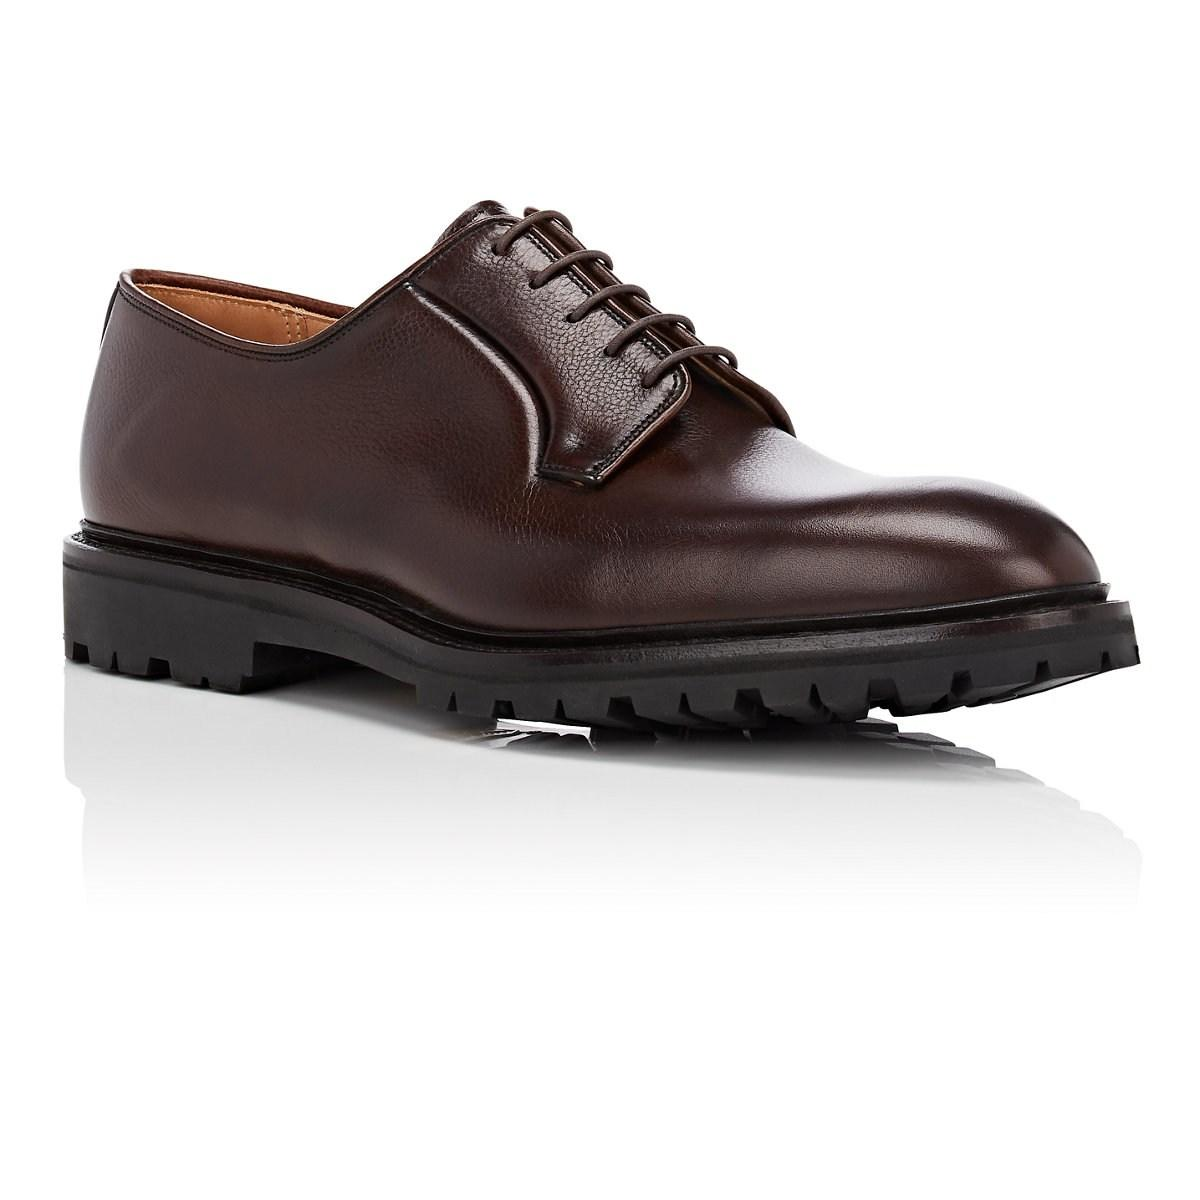 4ecdd84d20aec Crockett and Jones Lanark 2 Leather Bluchers in Brown for Men - Lyst